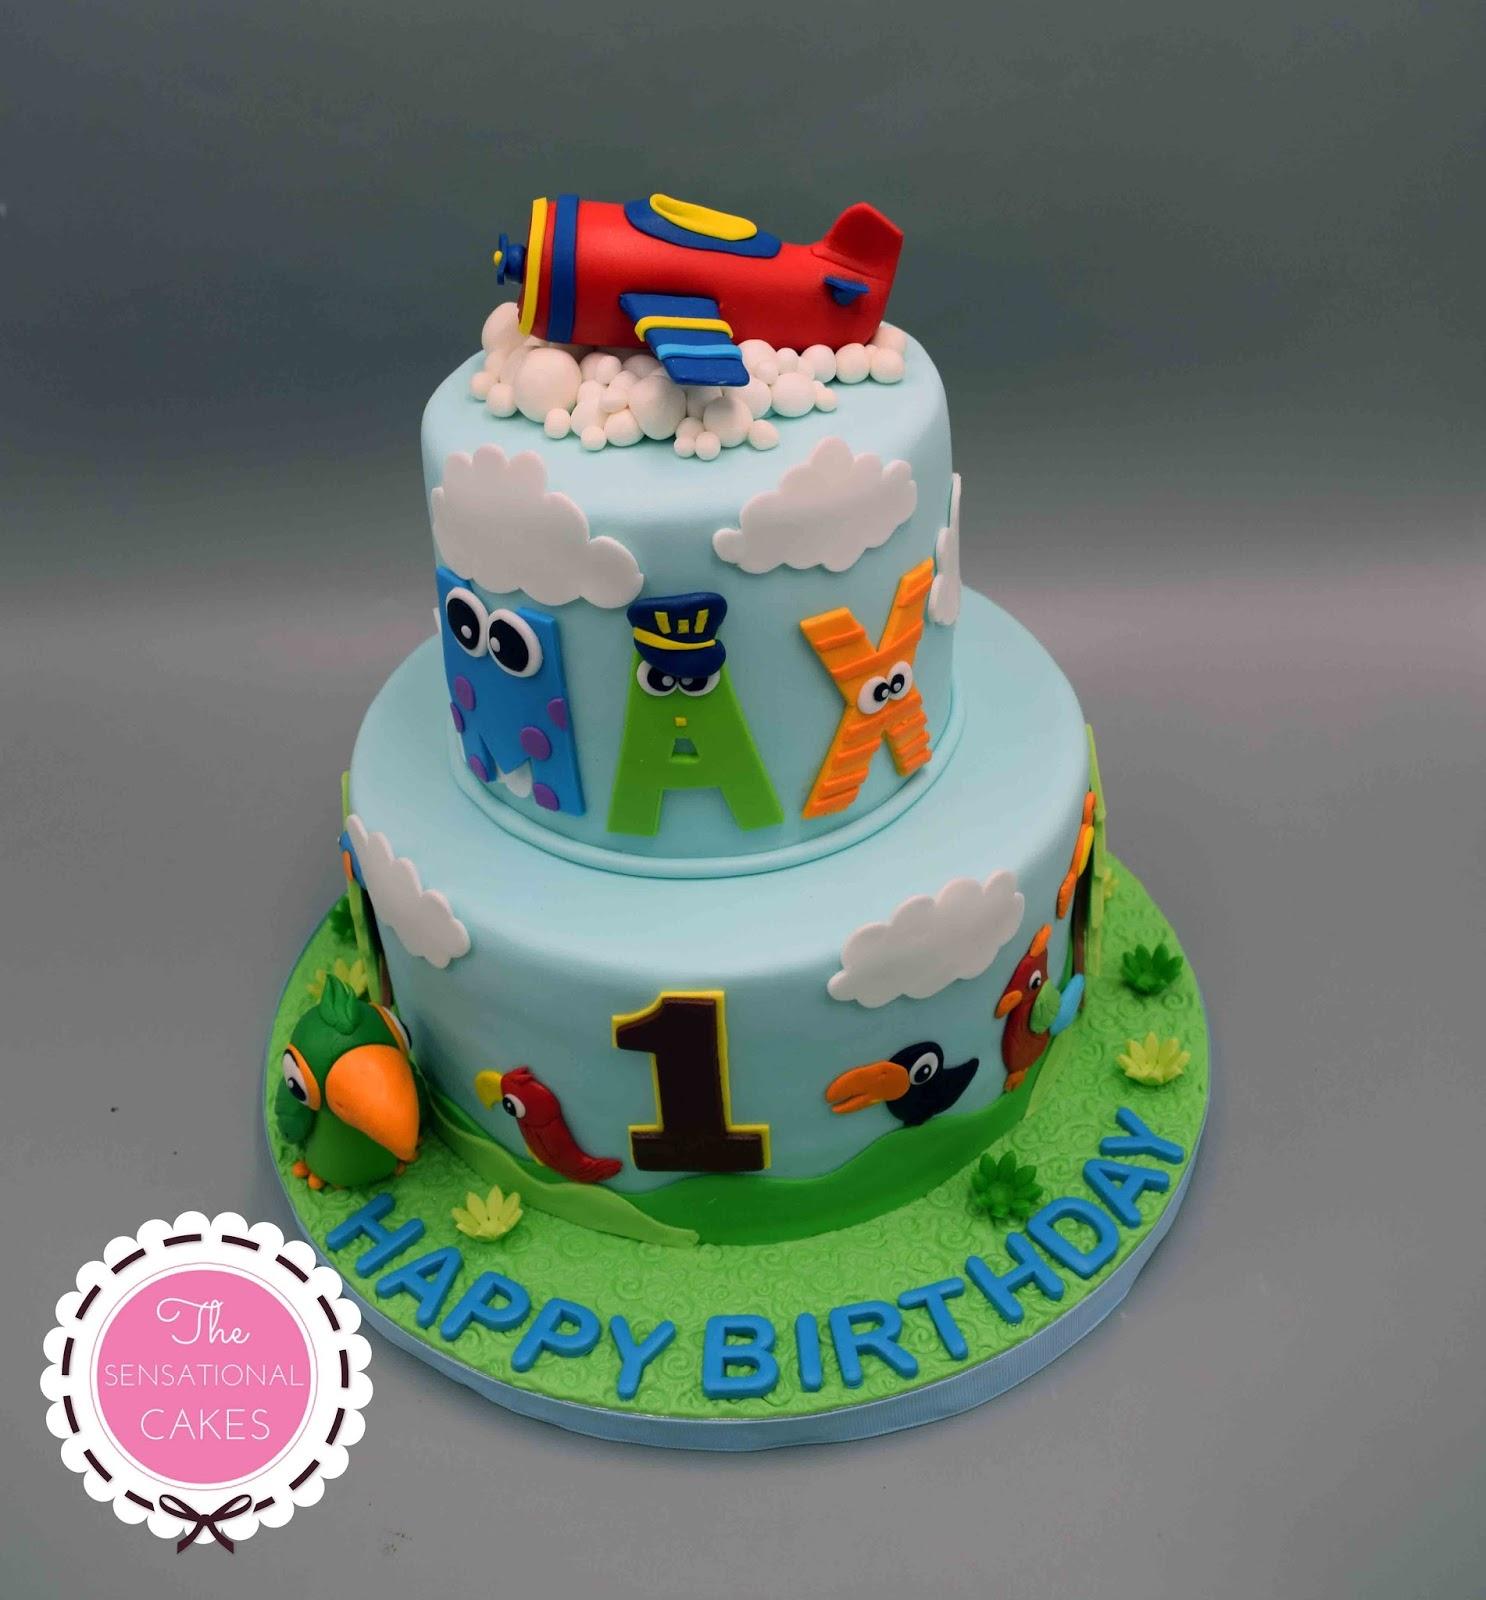 Tremendous The Sensational Cakes Airplane Theme Baby 1St Birthday 3D Cake Funny Birthday Cards Online Necthendildamsfinfo